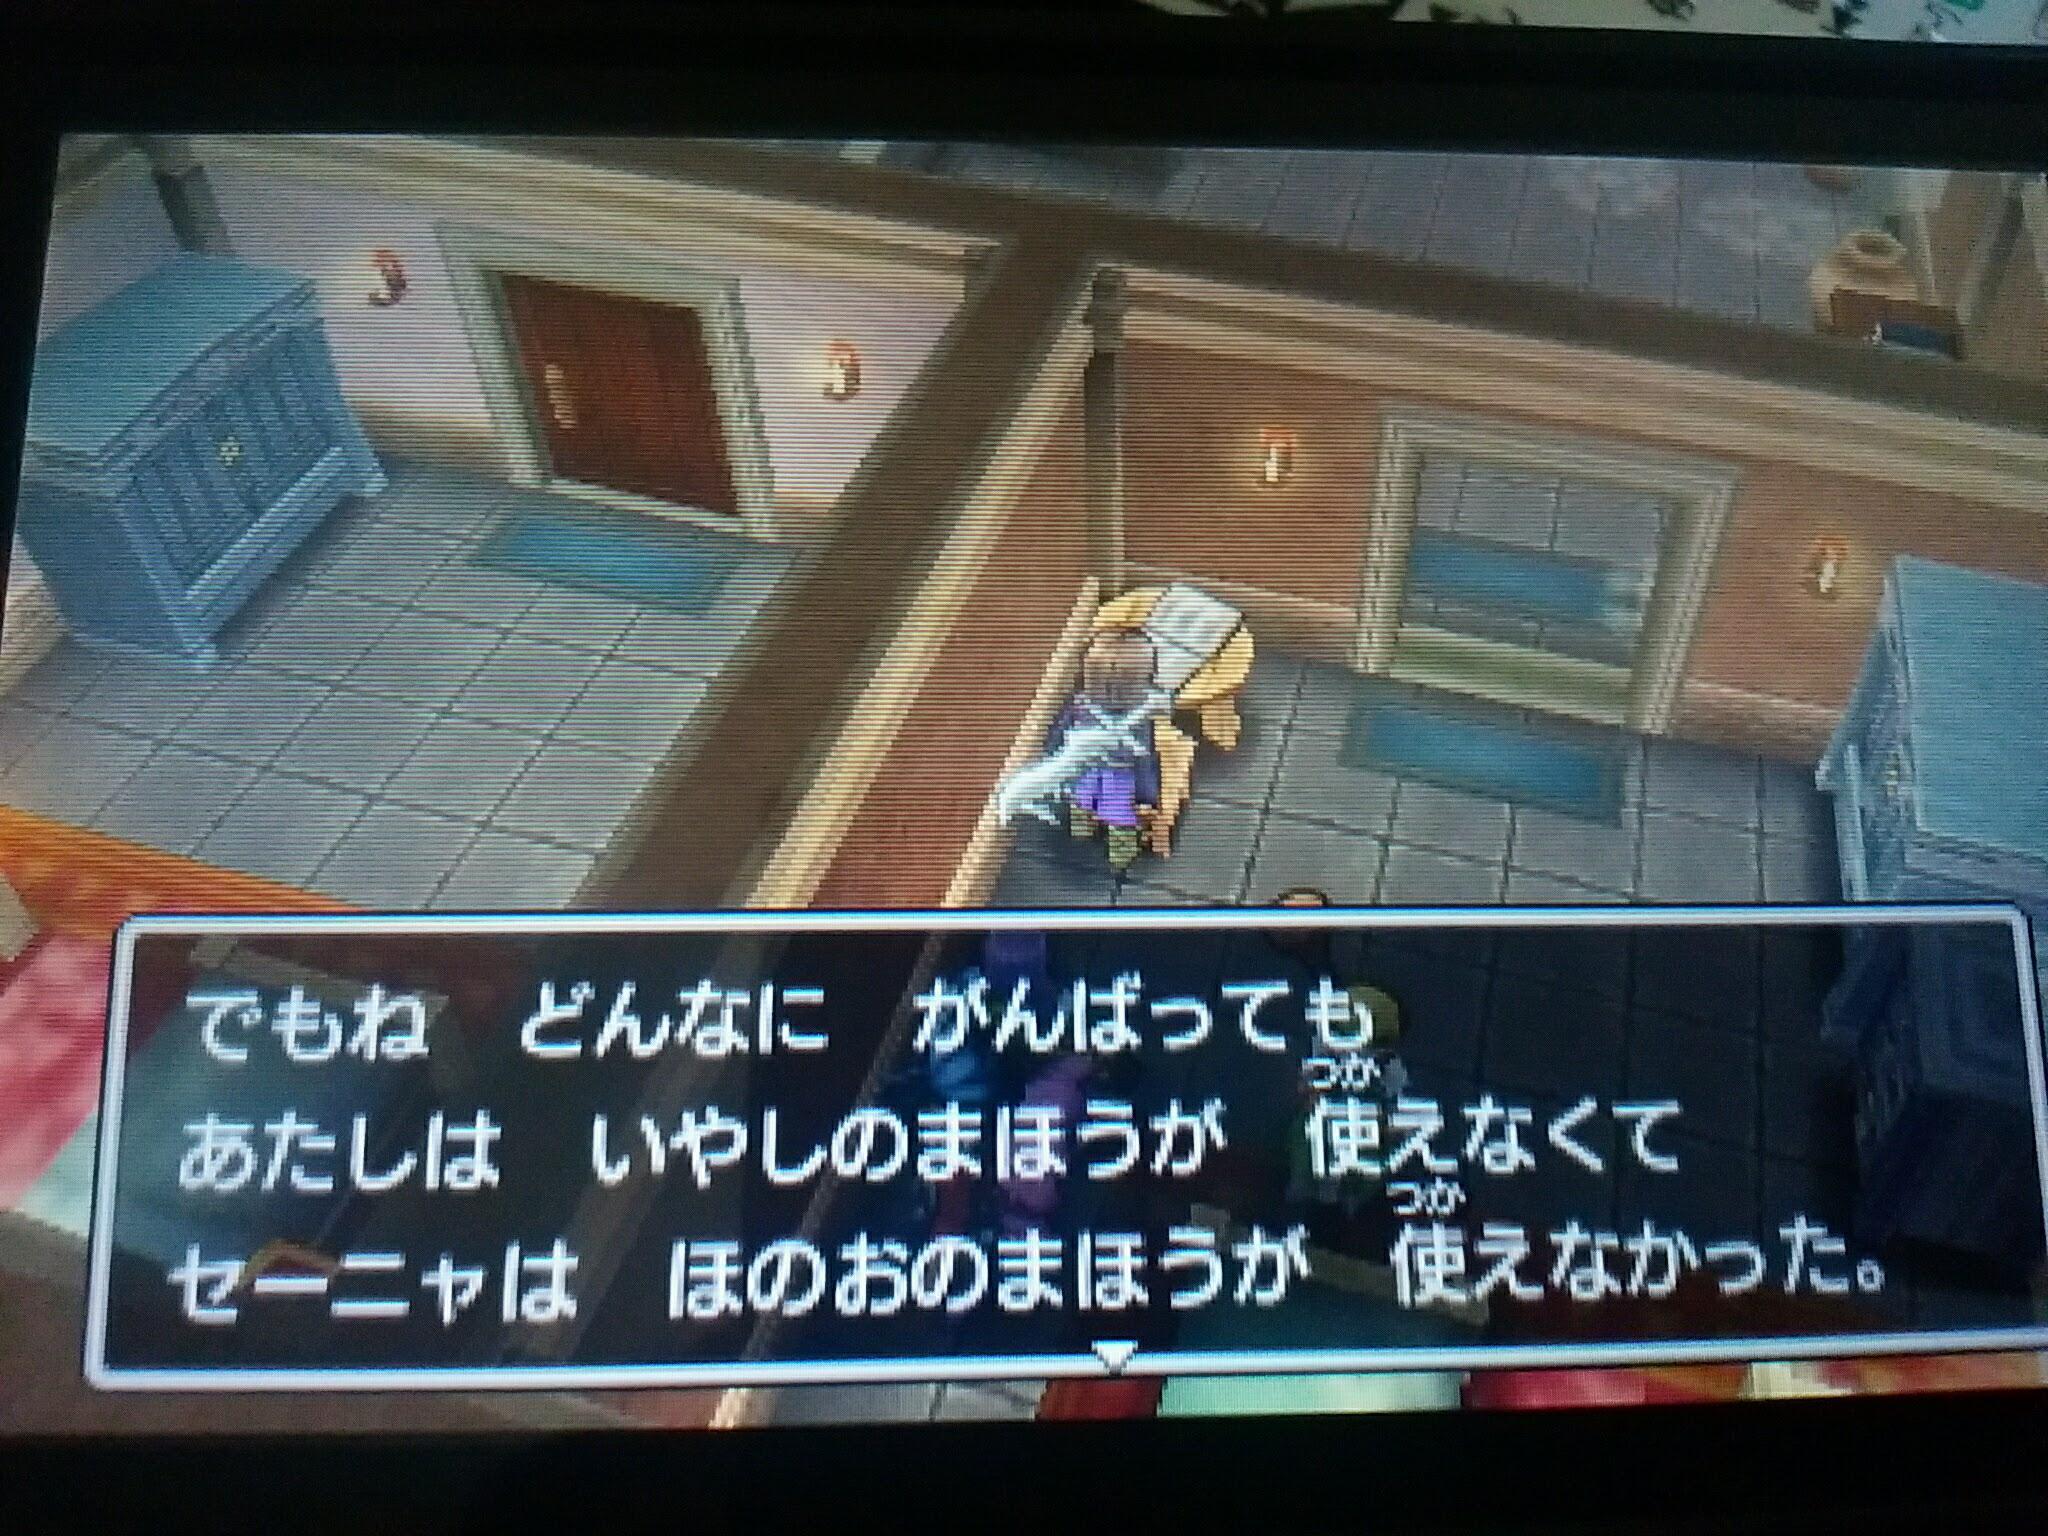 1sBVjXGJRMrVF - ドラクエ11の主人公片手剣と両手剣どっちがいいの?